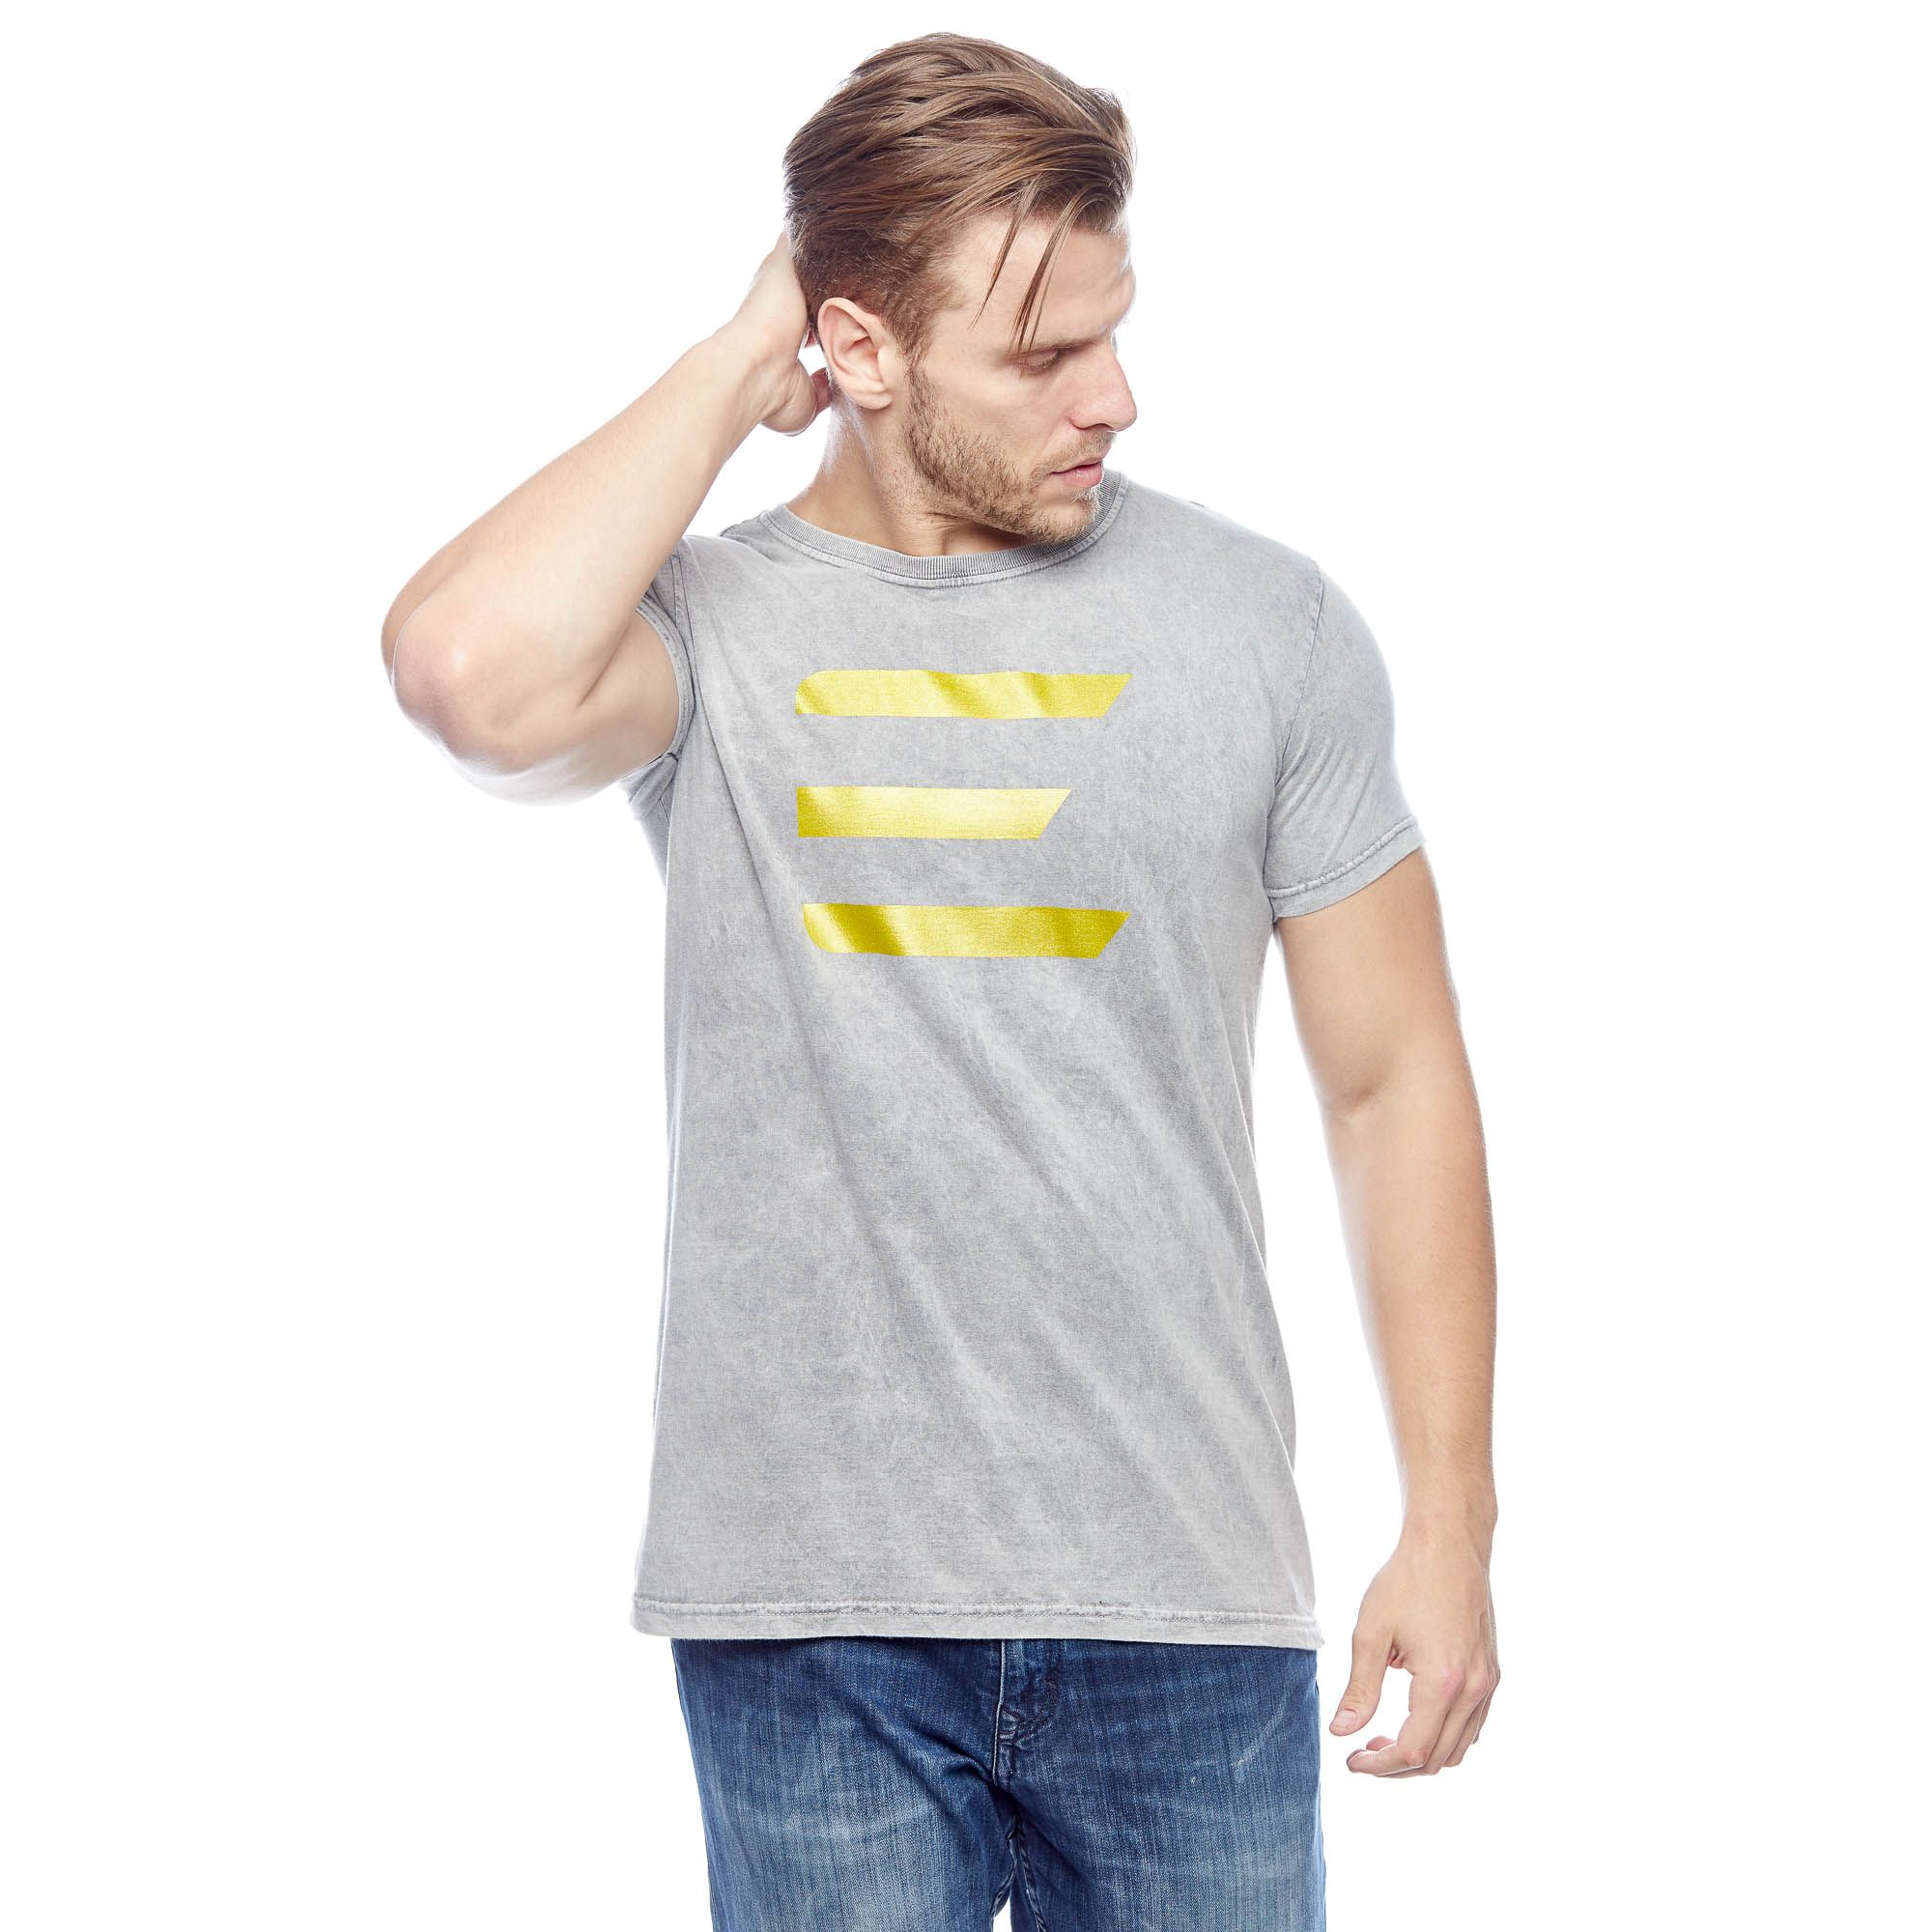 Camiseta Evolvee Básica Marmorizada E-Sport Masculina